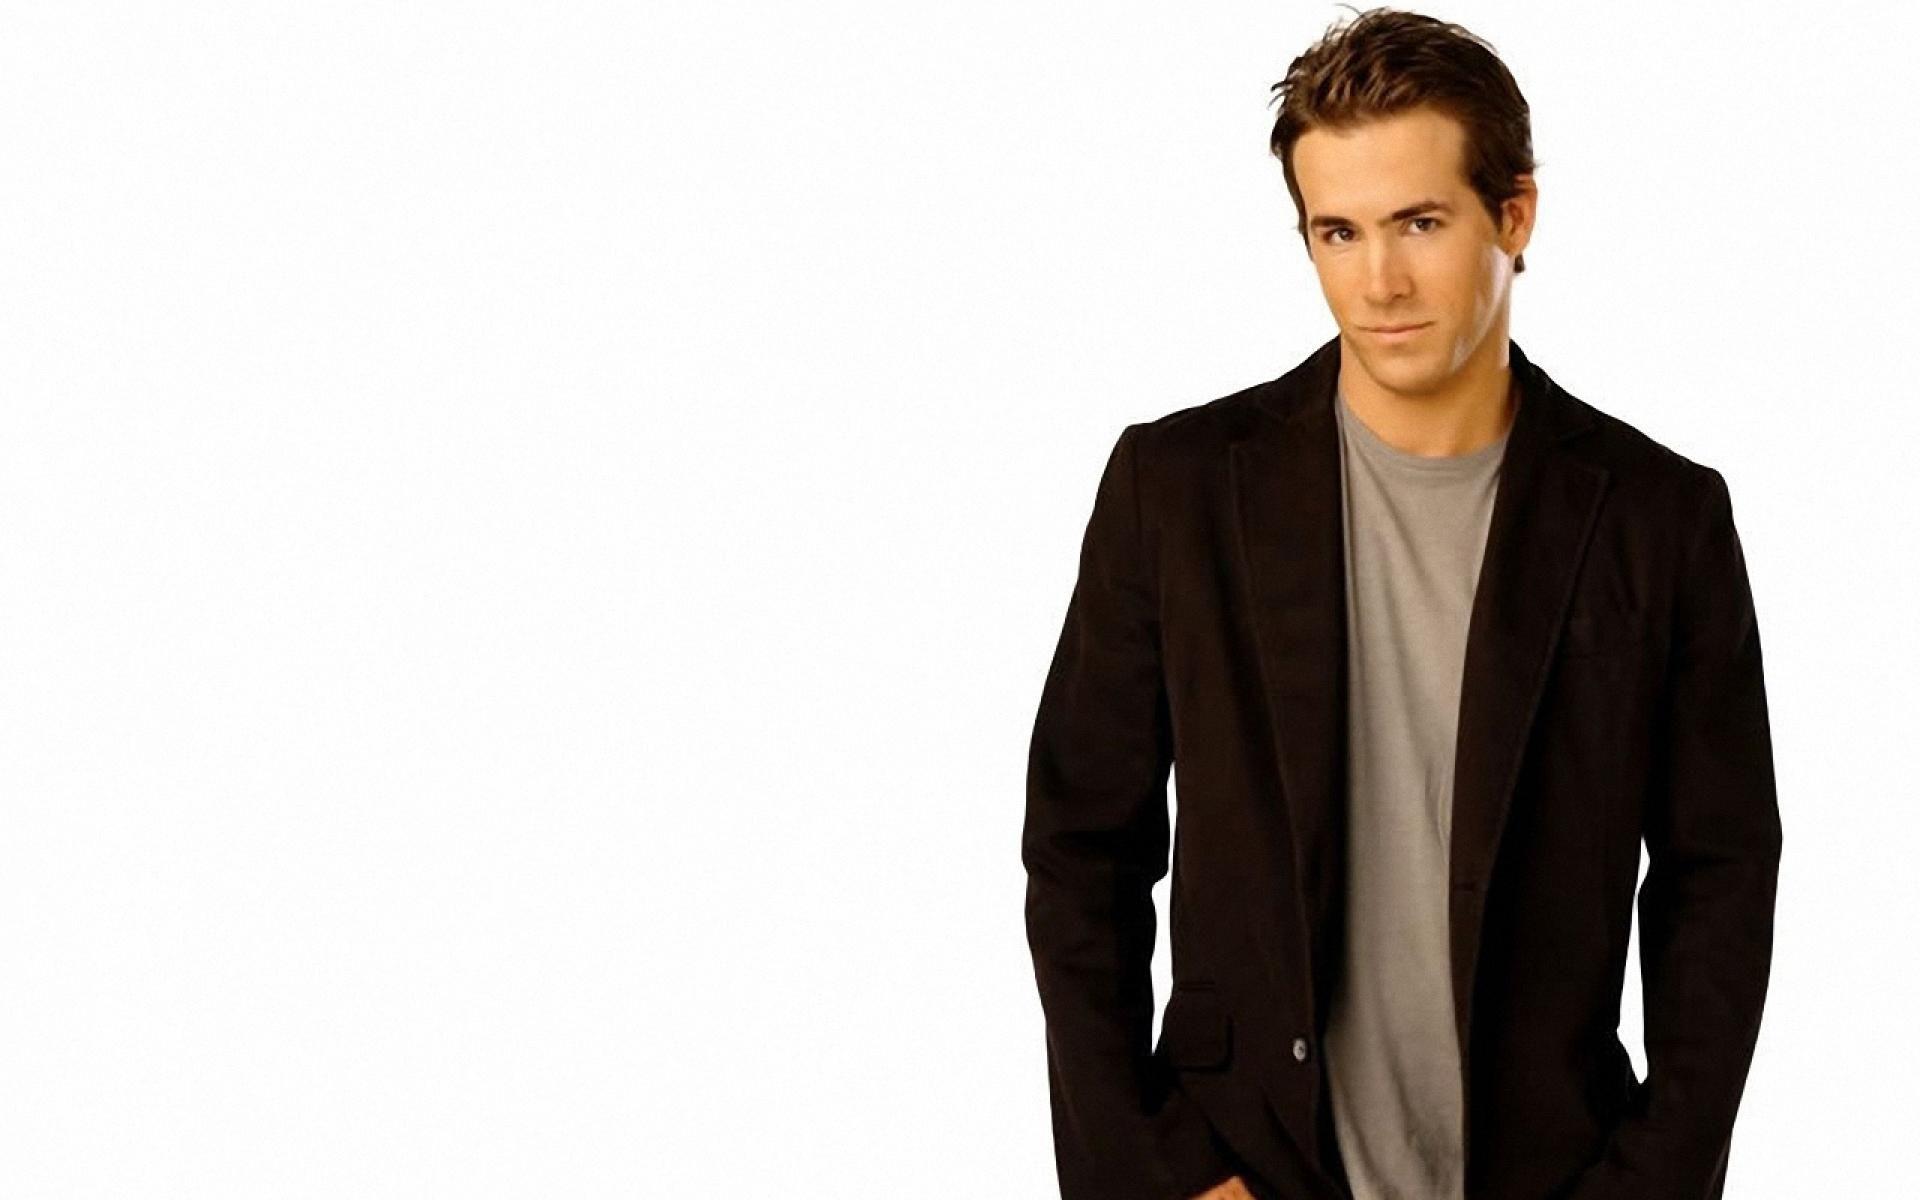 Ryan Reynolds Hd Wallpaper Google Search